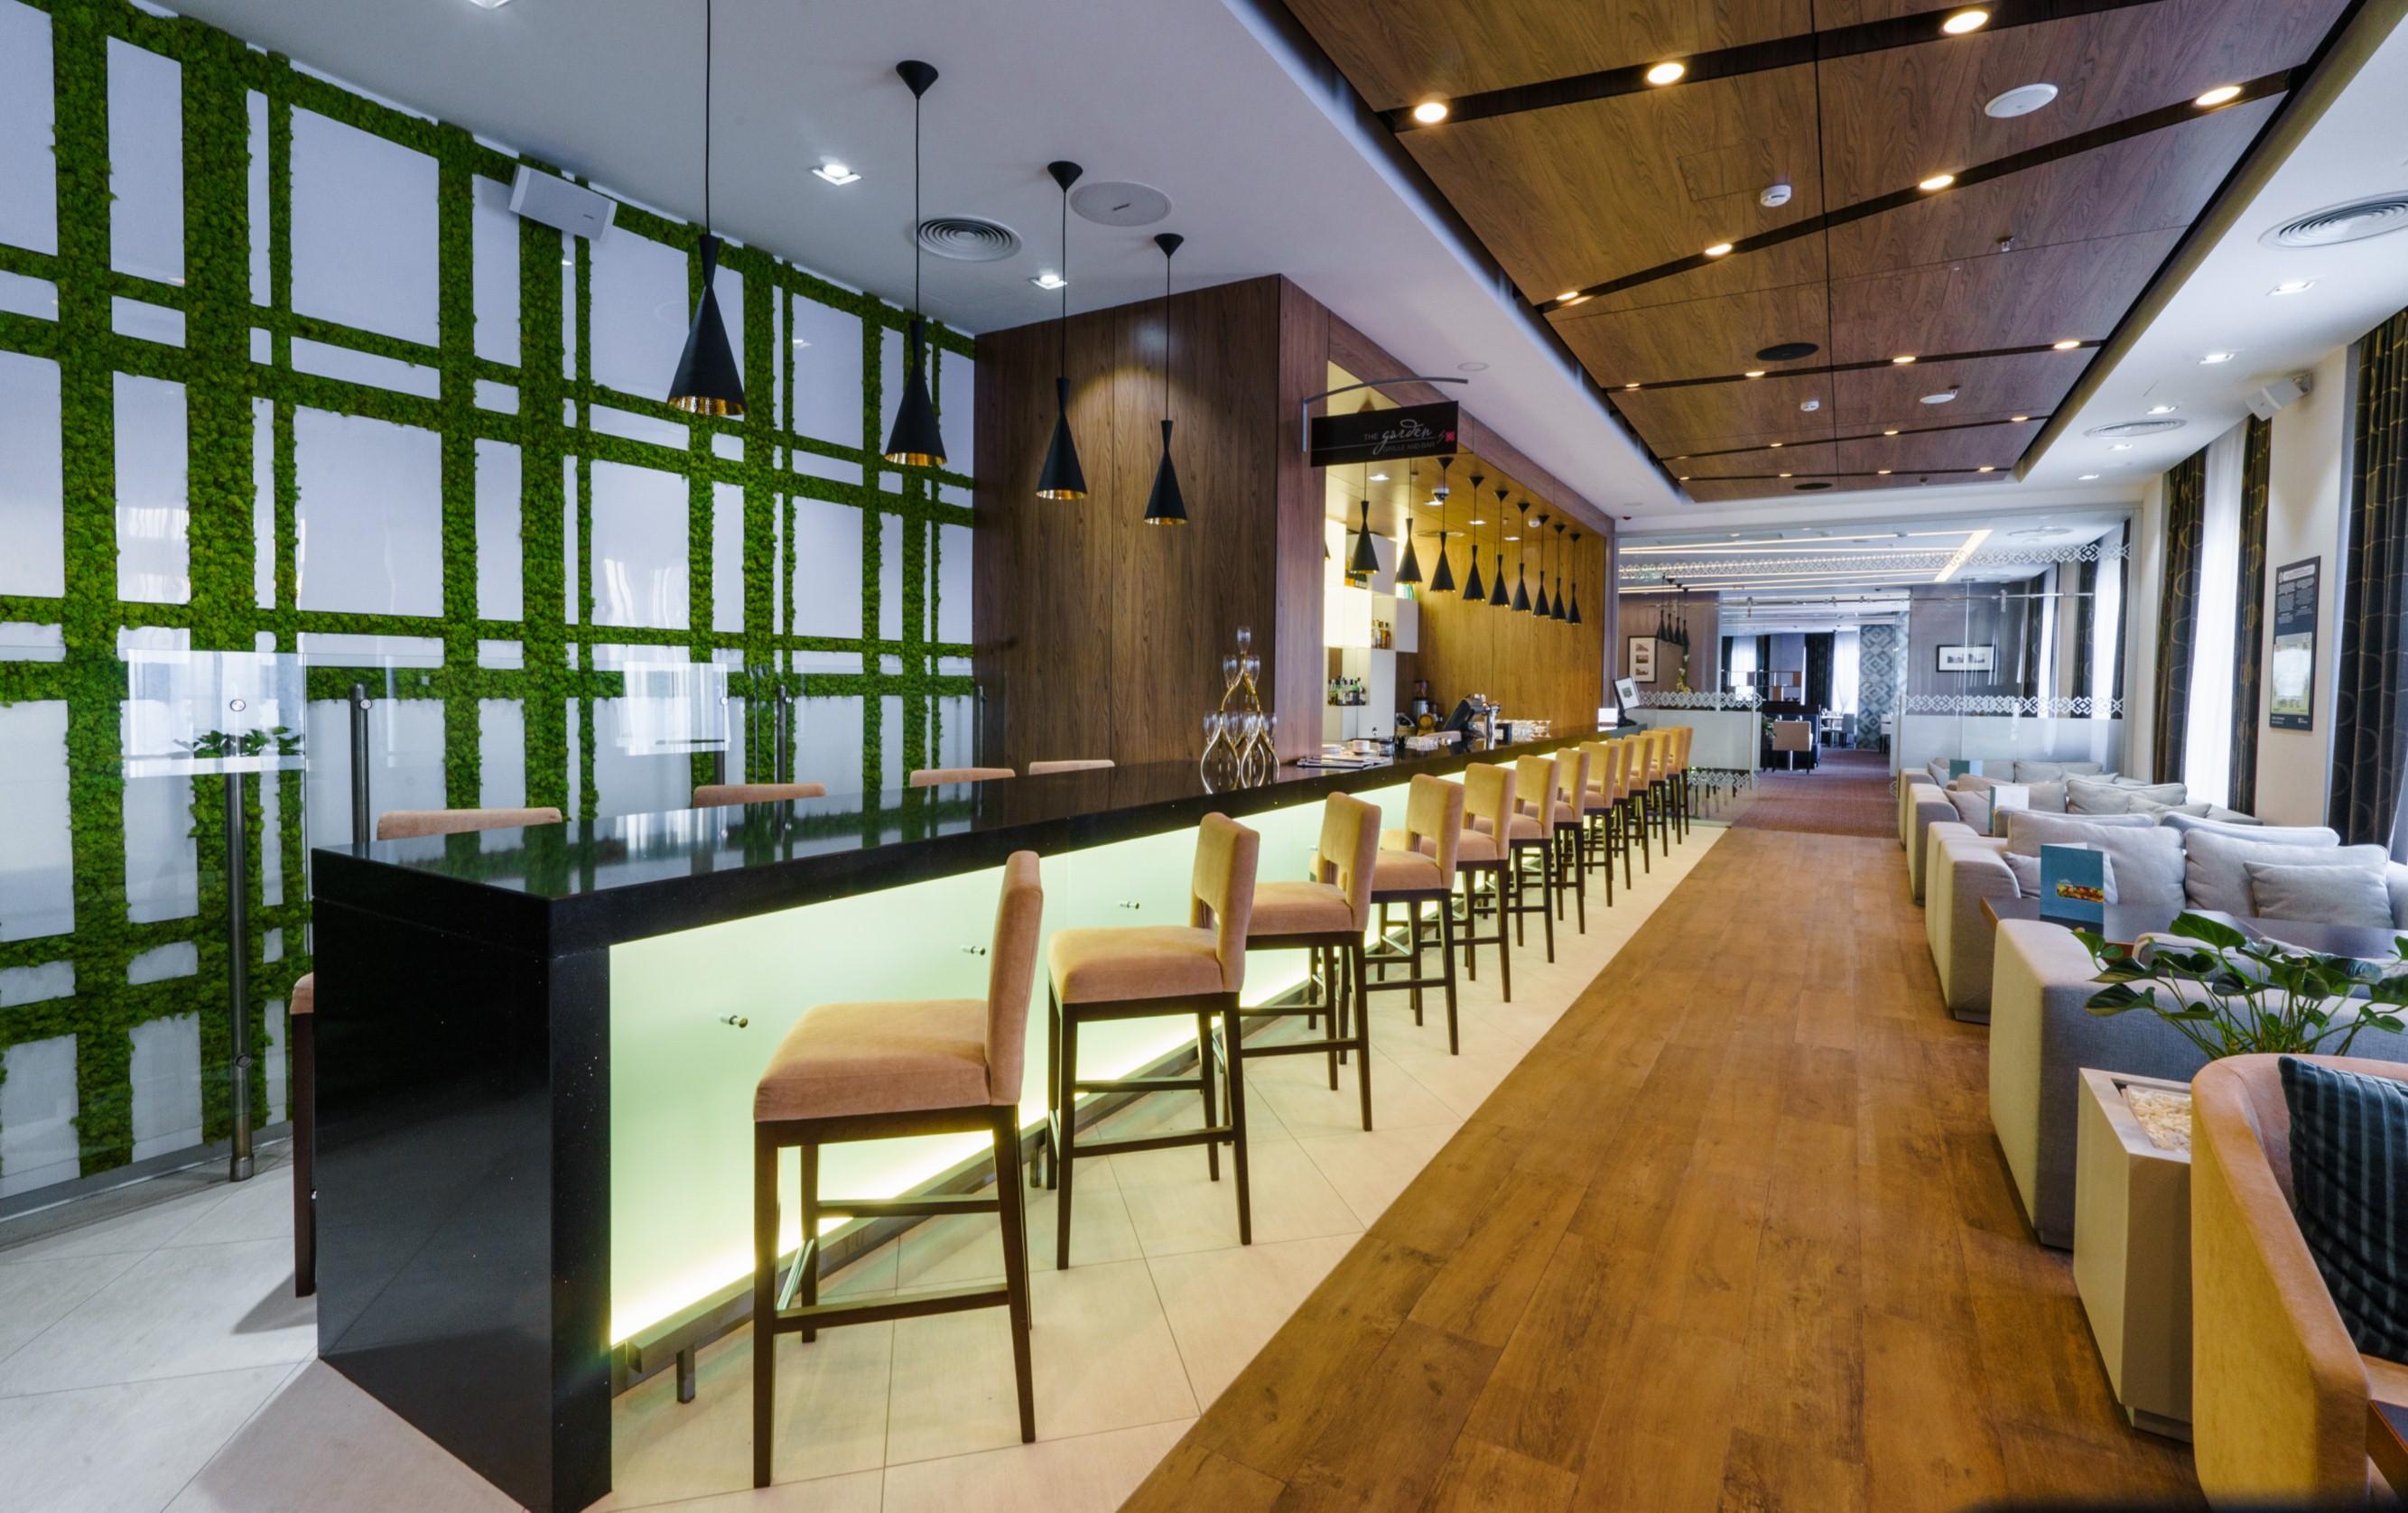 Отель <i>Hilton Garden Inn</i> вУфе. Дизайн интерьера— бюро <i>MAD architects</i>.